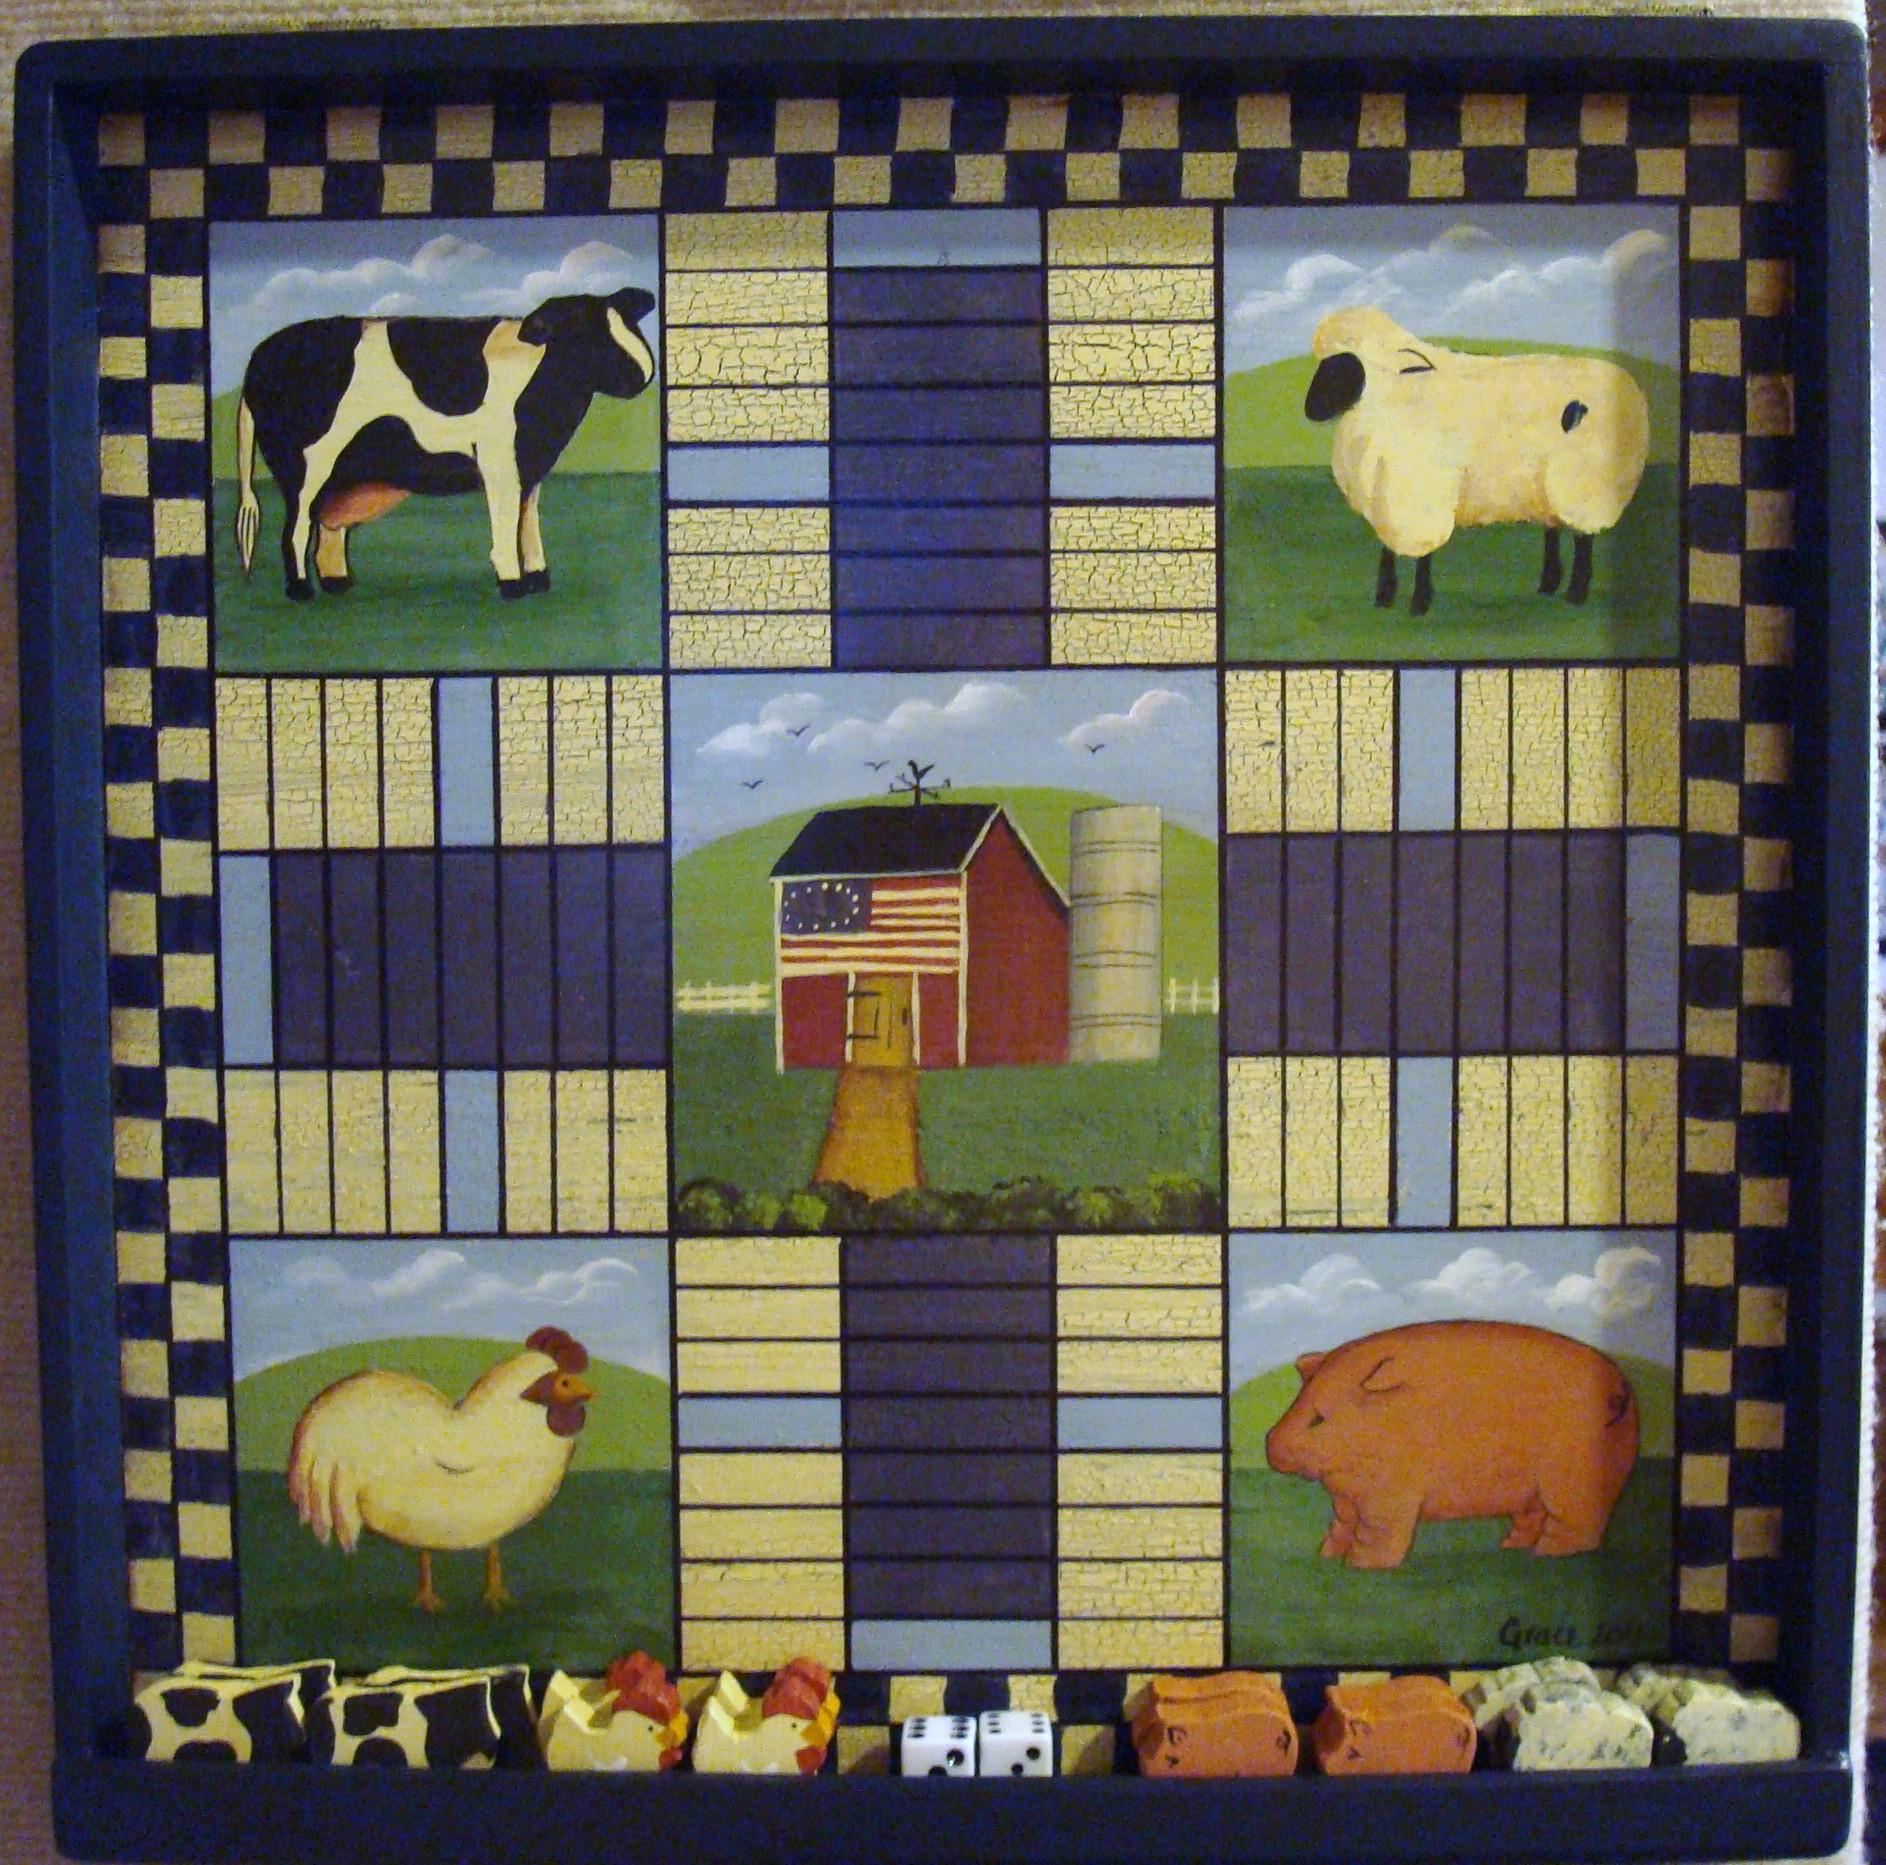 Farm Animal Pachisi Board